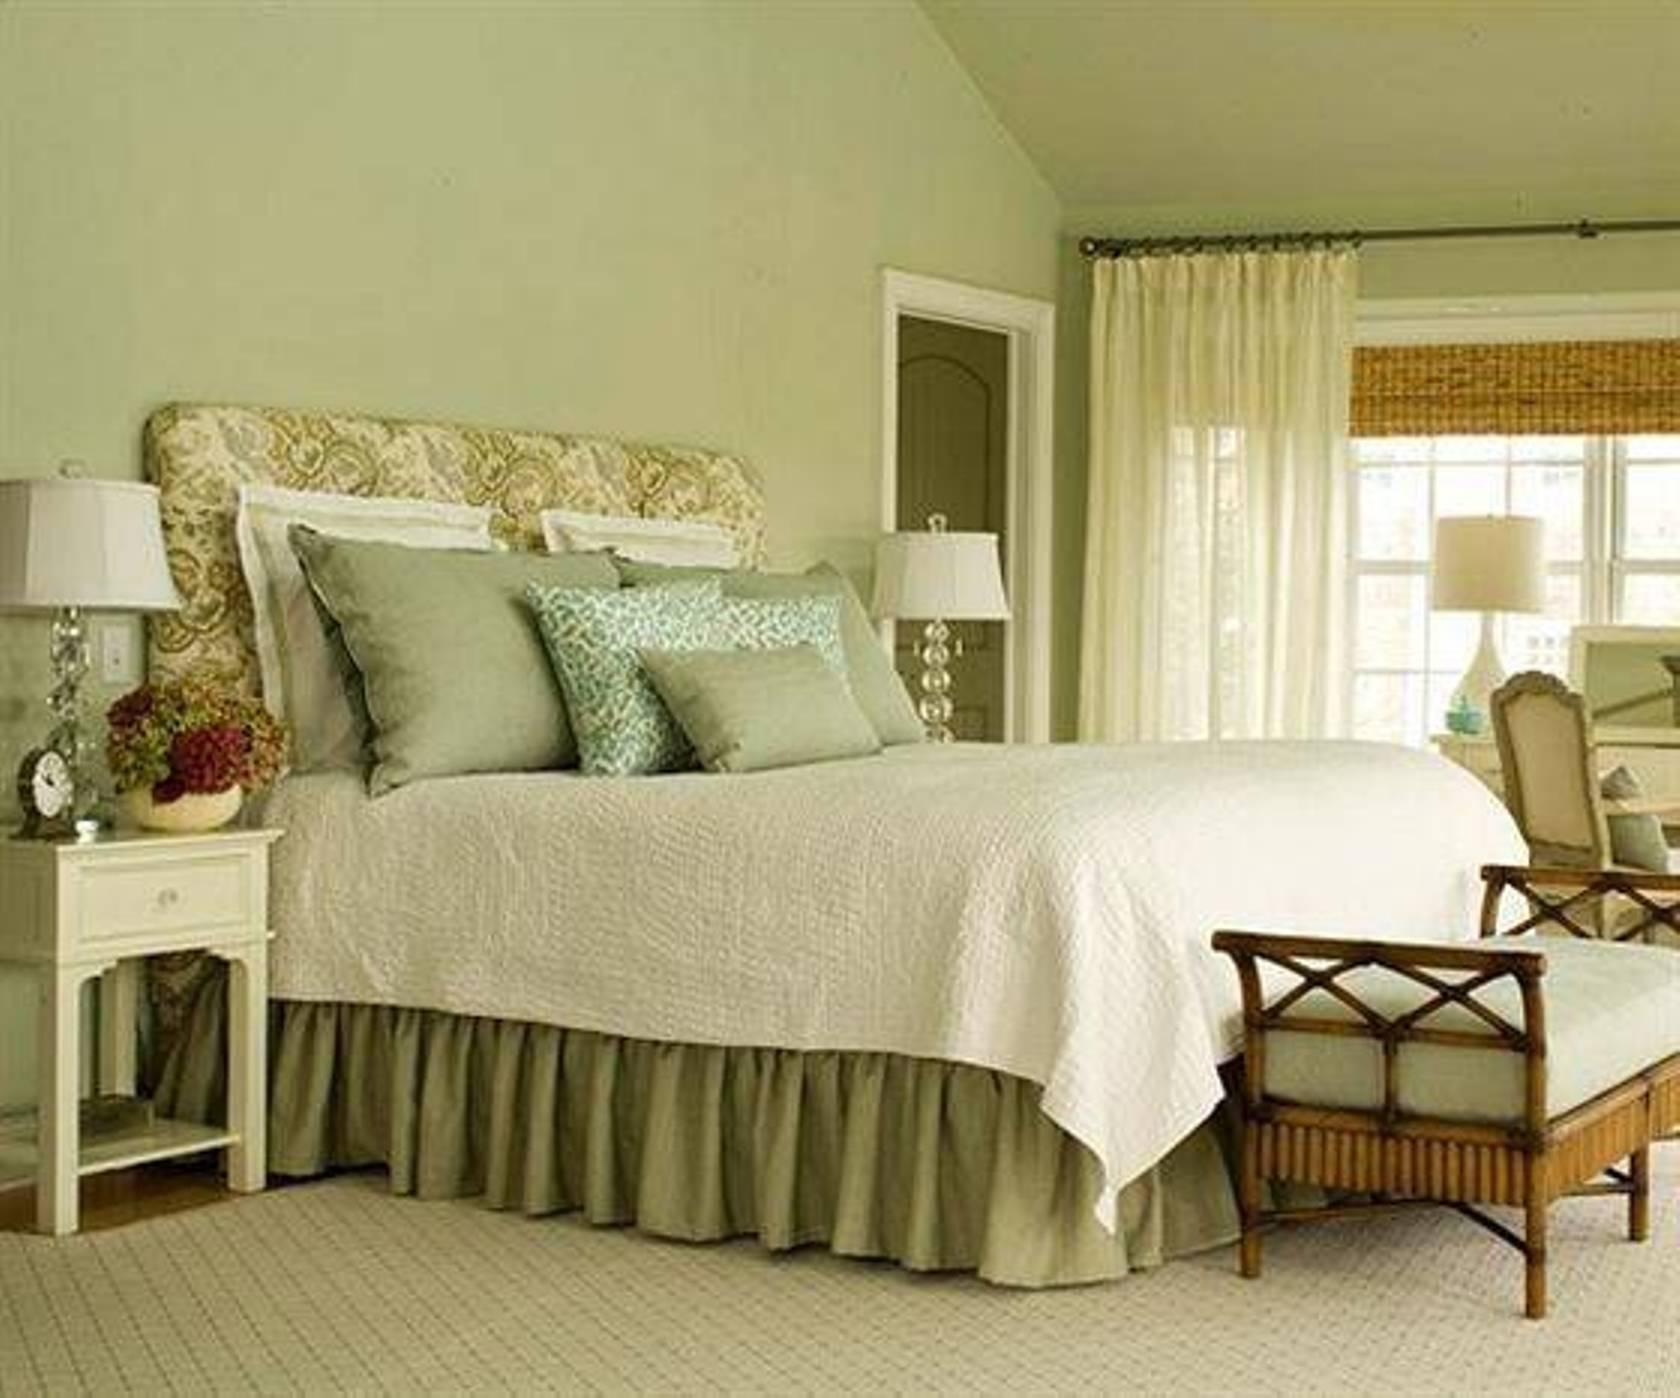 C mo decorar un dormitorio de matrimonio qu s y qu no for Como decorar un dormitorio matrimonial pequeno